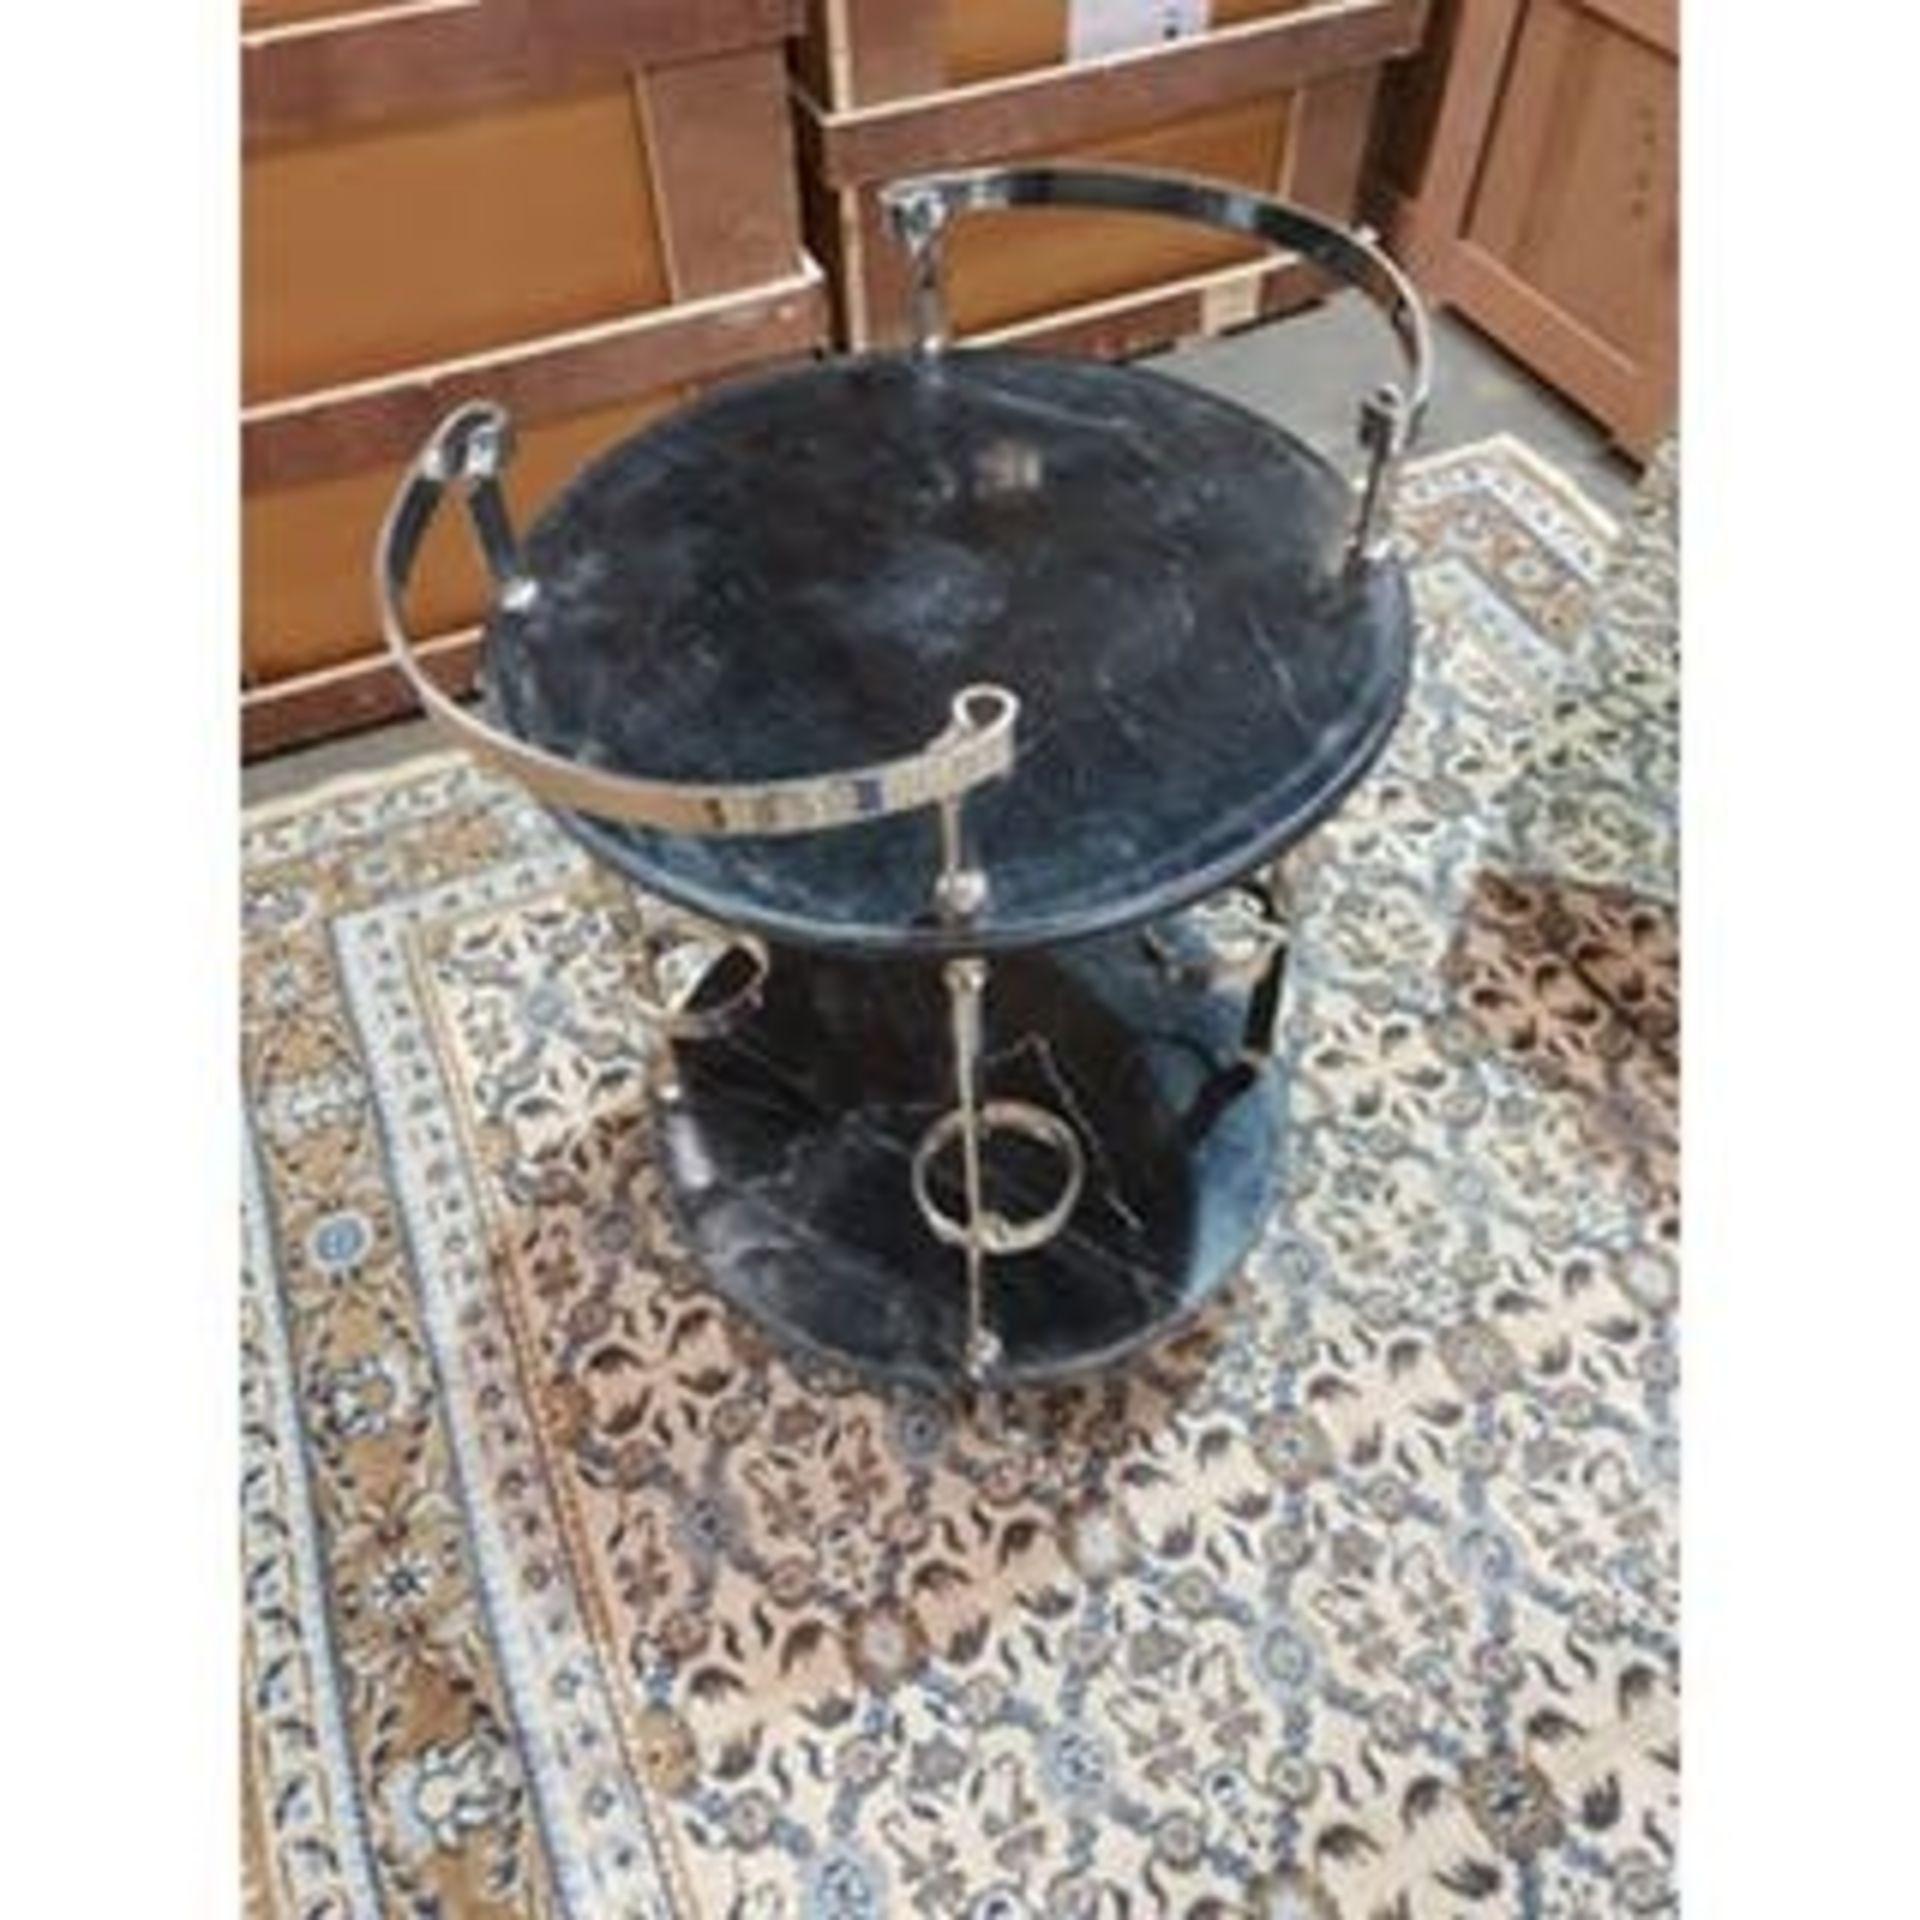 Lot 202 - Deco Bar Cart Black Marble-Top and Nickel Bar Cart